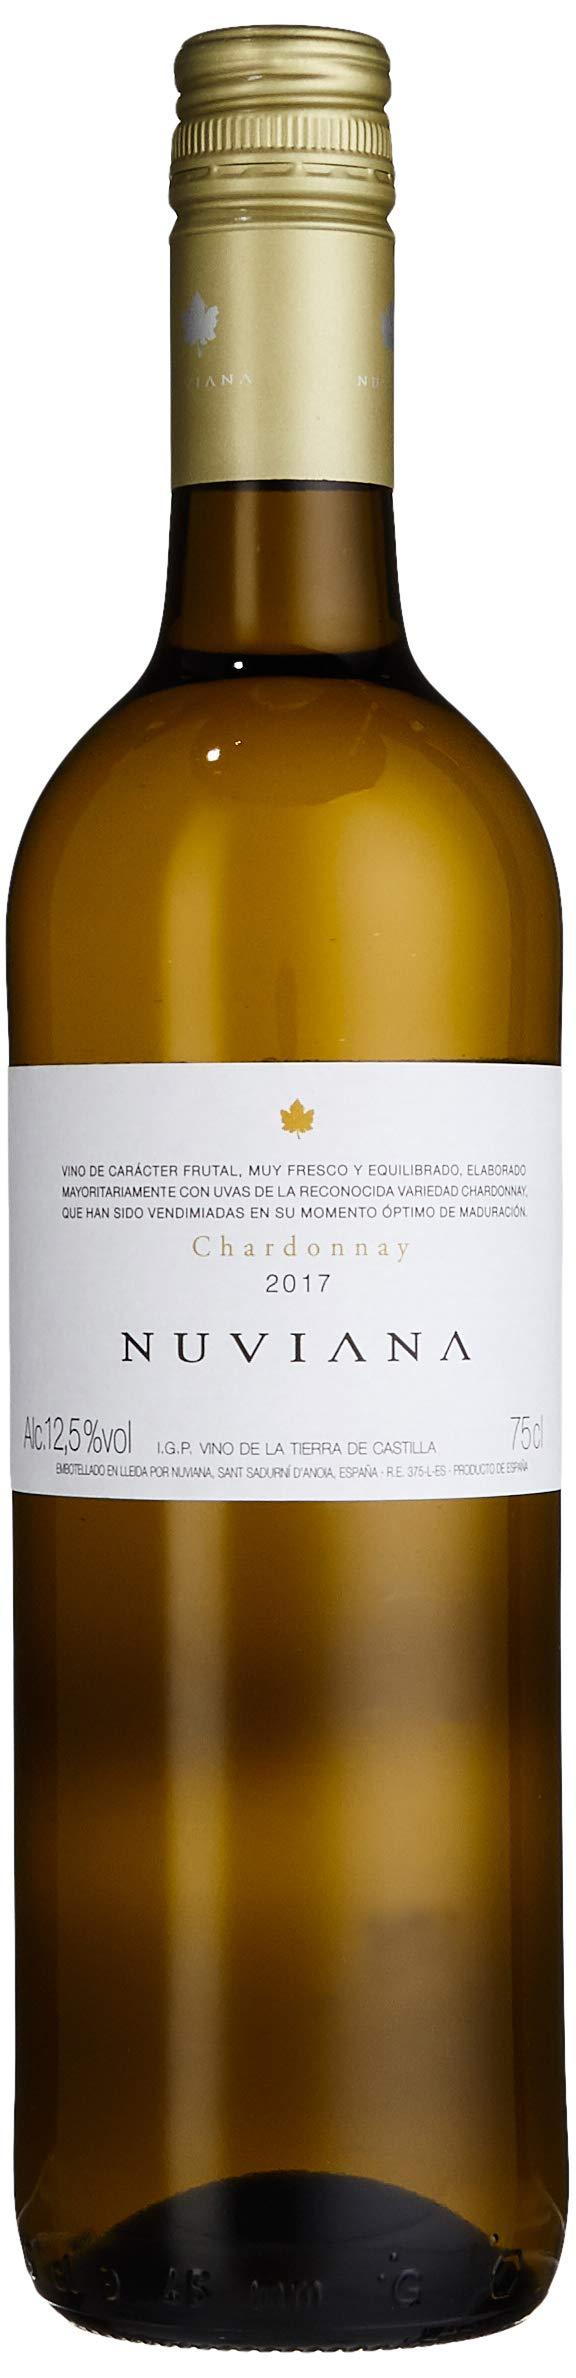 Bodegas-Nuviana-Chardonnay-6-x-075-l